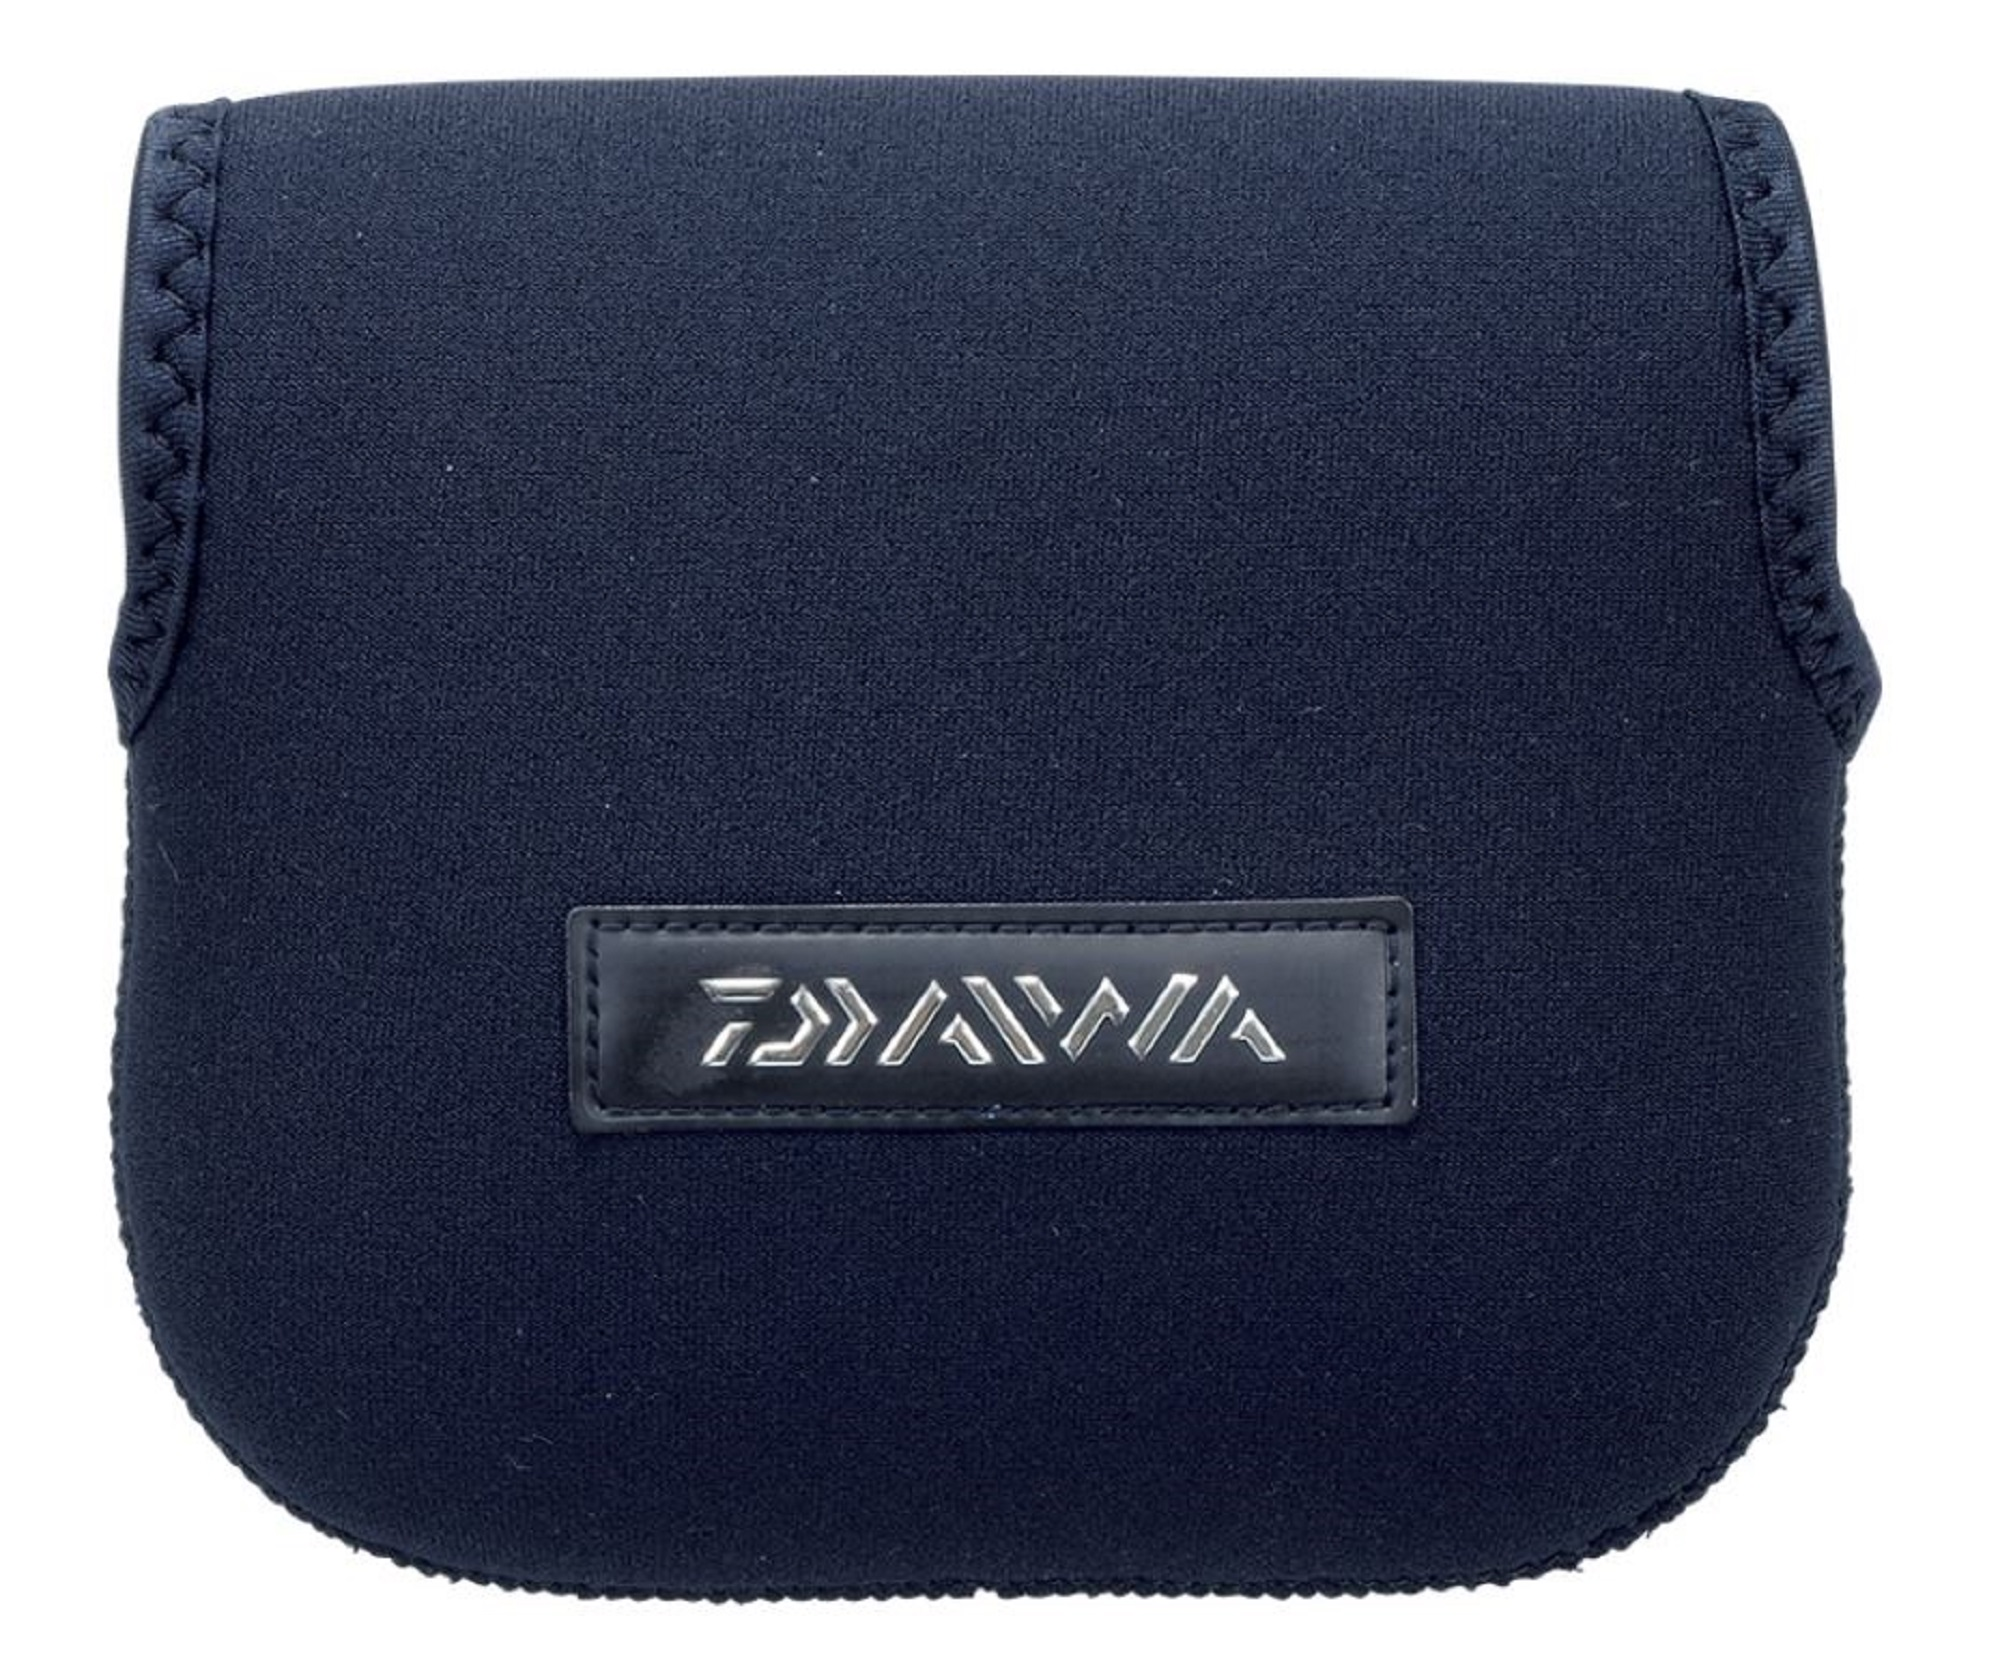 Daiwa SP-M Neoprene Fishing Reel Case Bag Size M 19 x 27 cm (7092)